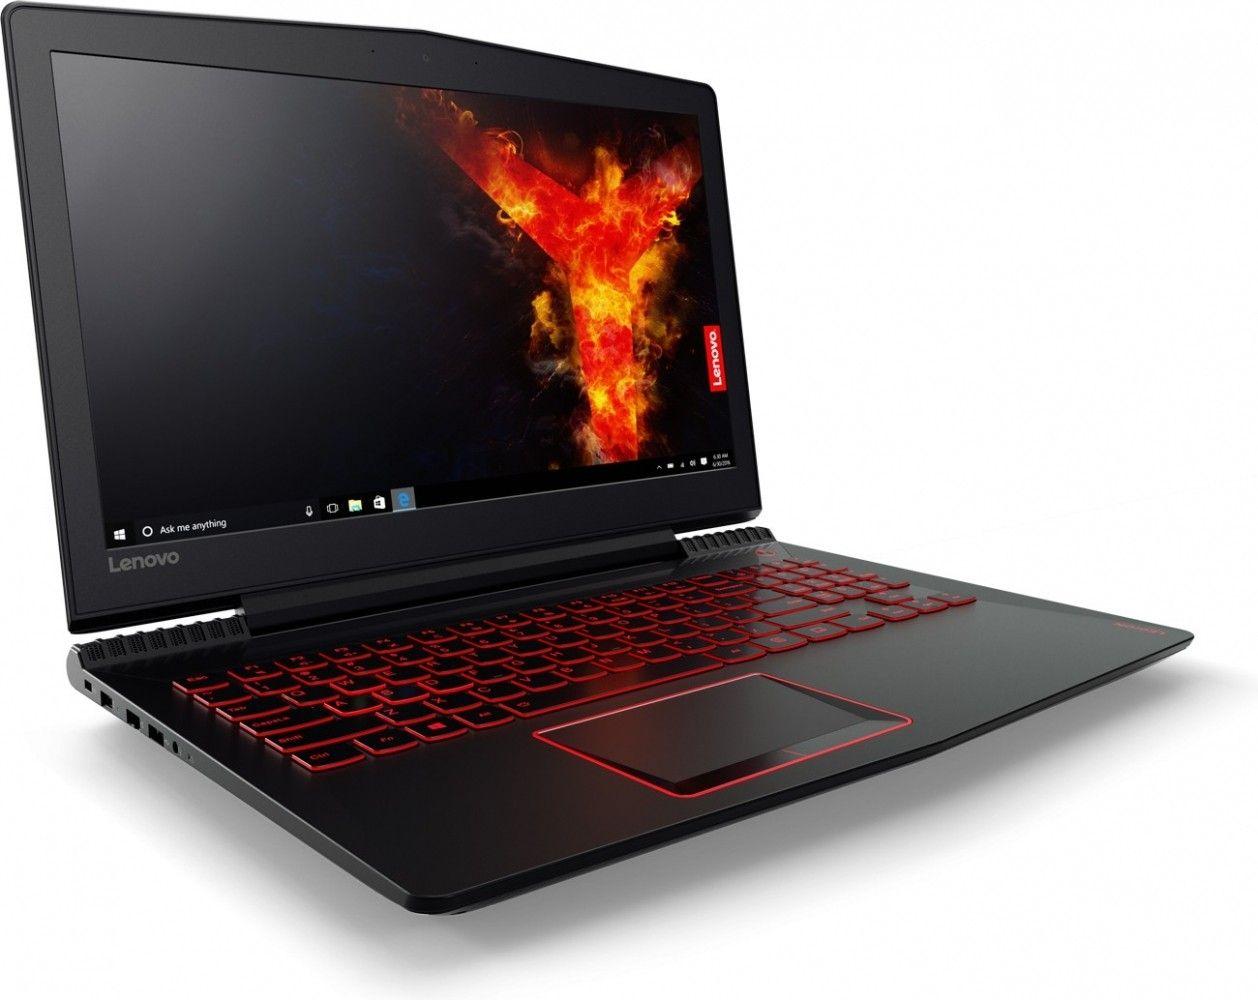 купить ноутбук цена